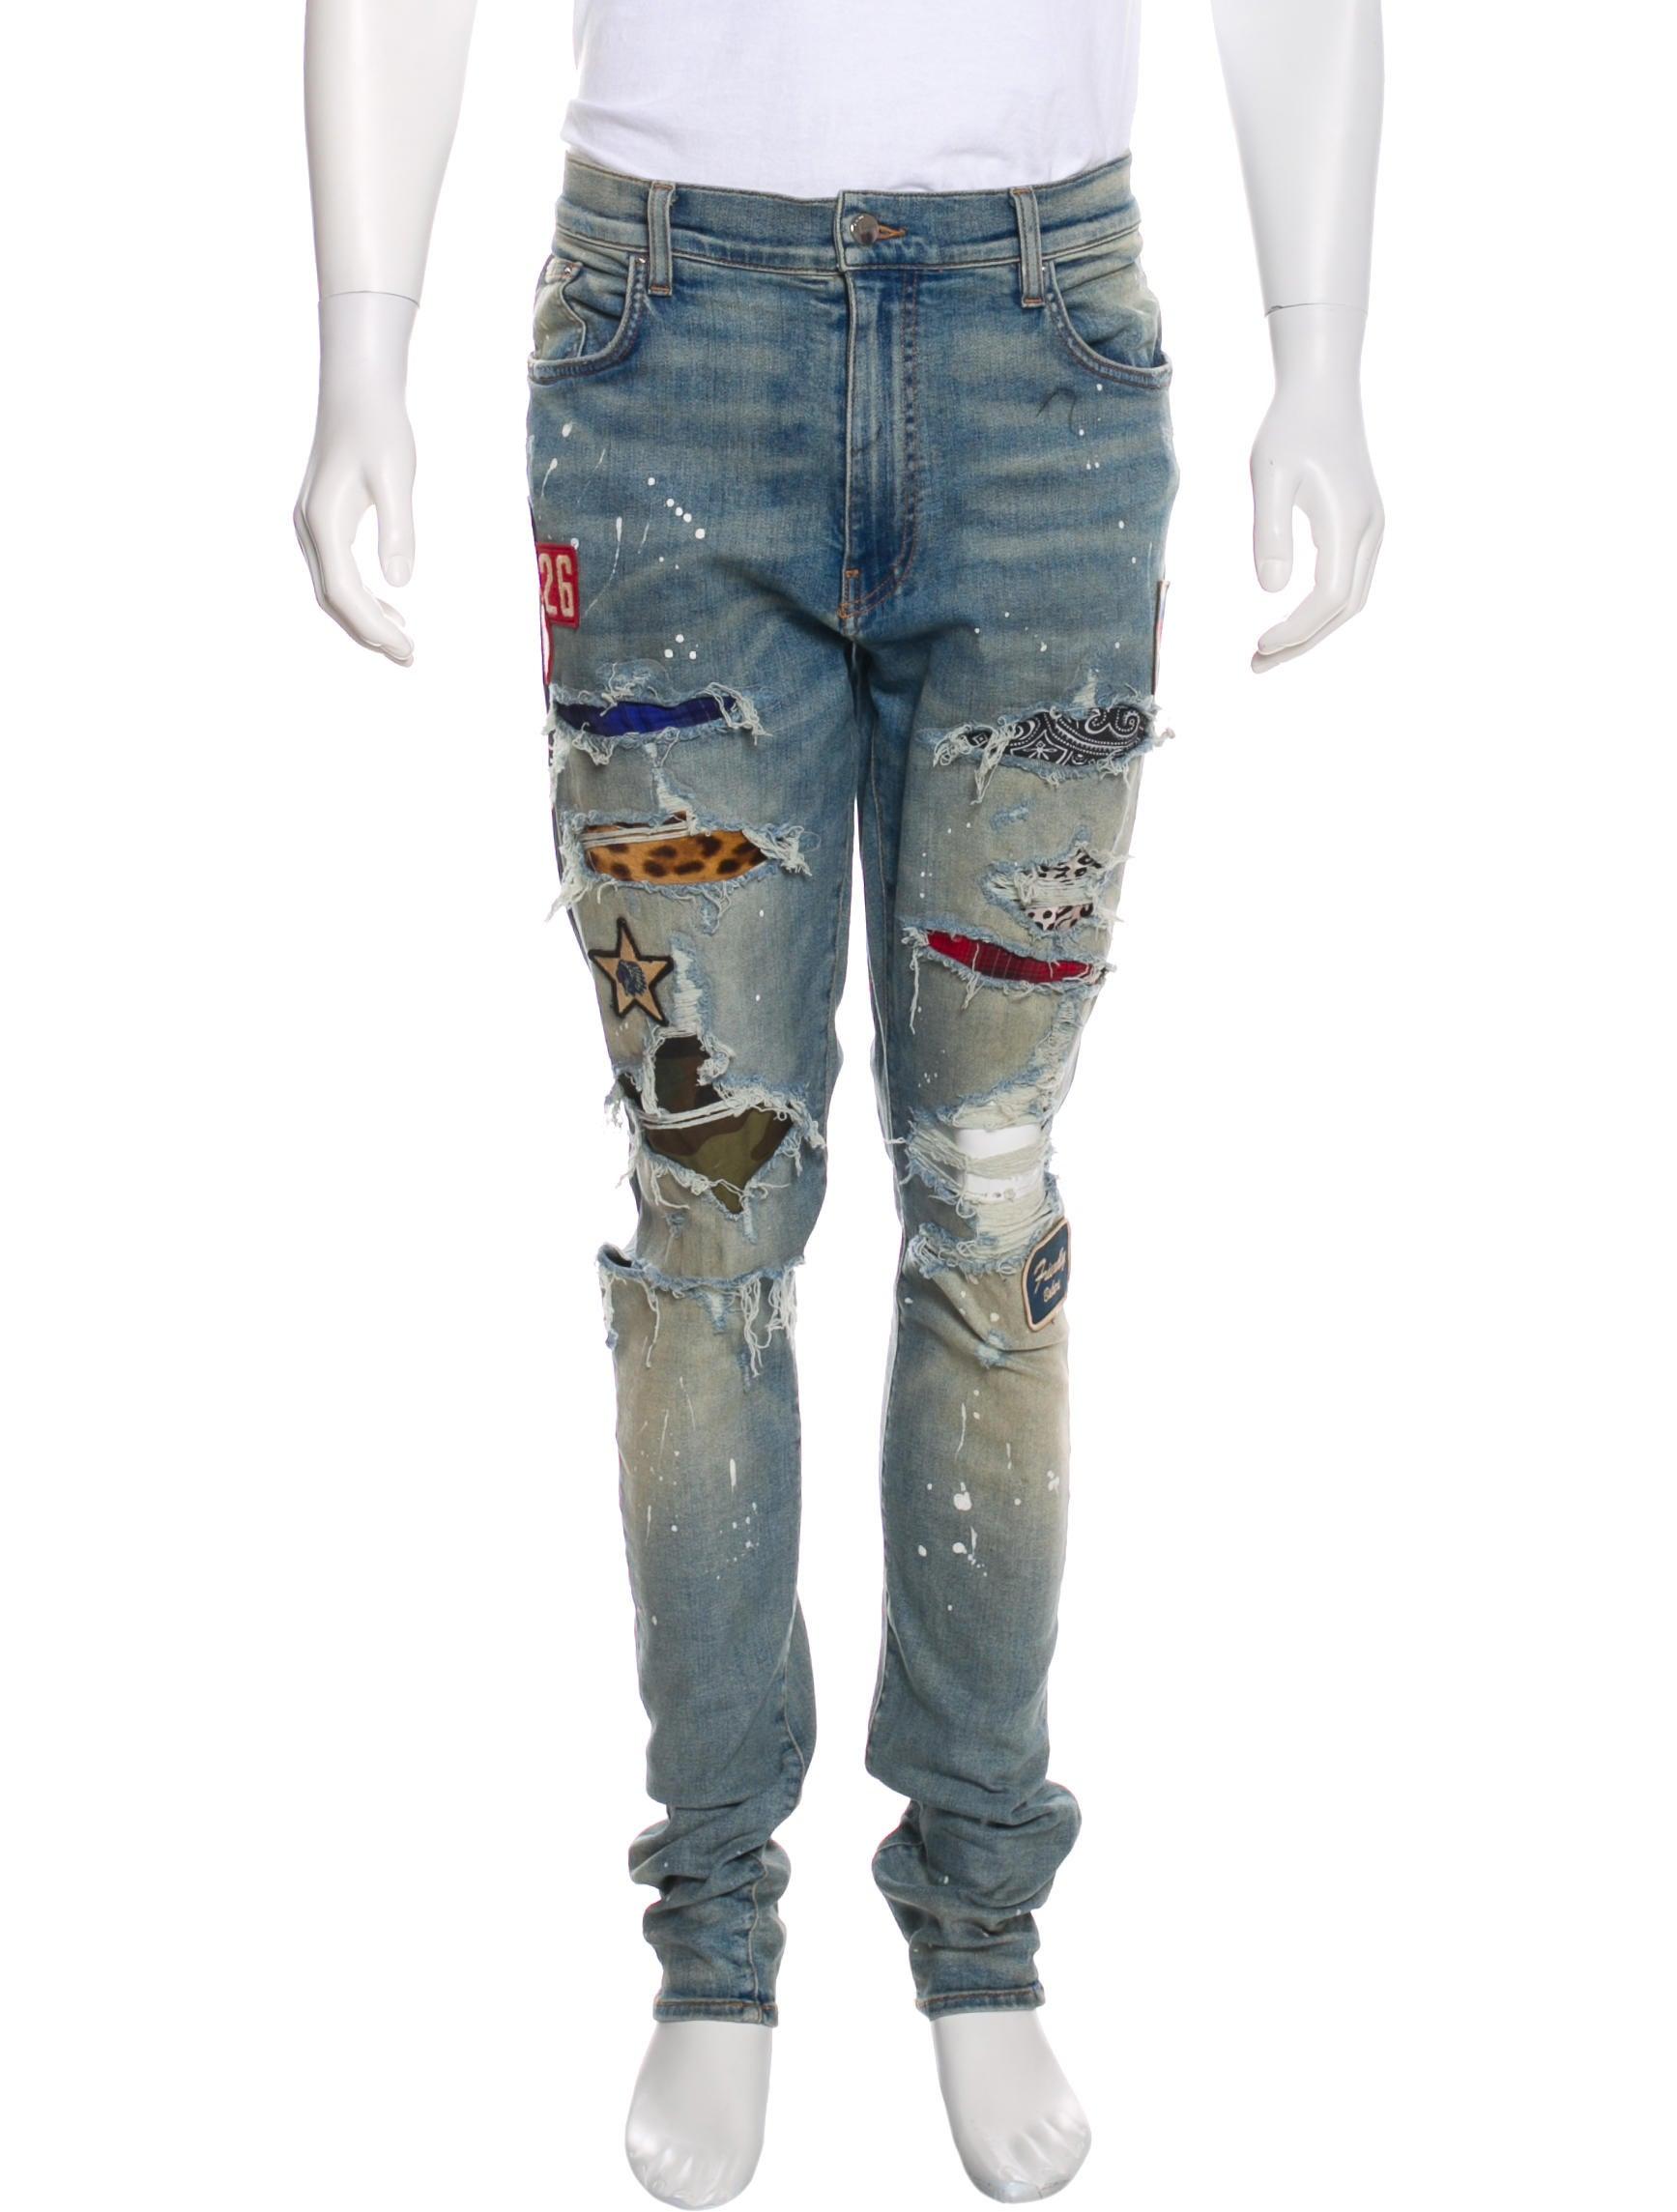 a385a9a4213 Amiri Distressed Patchwork Skinny Jeans - Clothing - AMIRI21083 ...